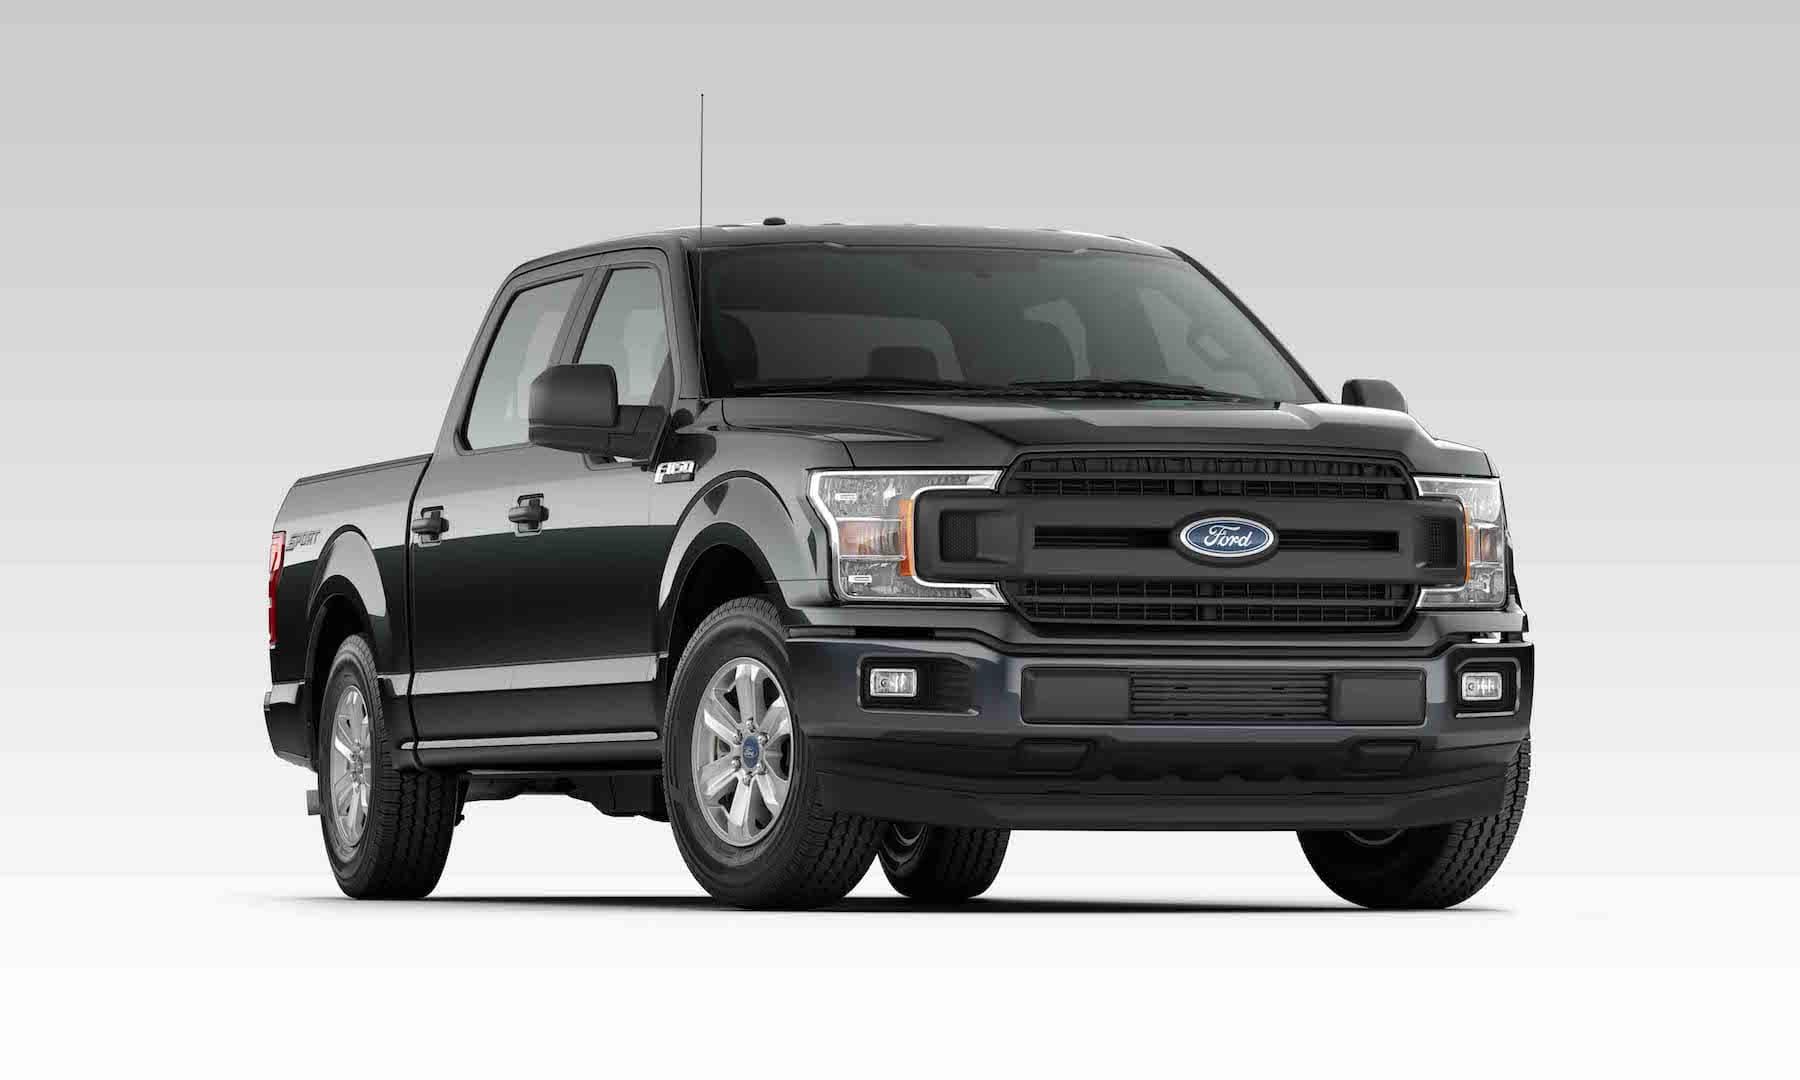 Ford F150 Trim Levels | Bremerton, WA | West Hills Ford